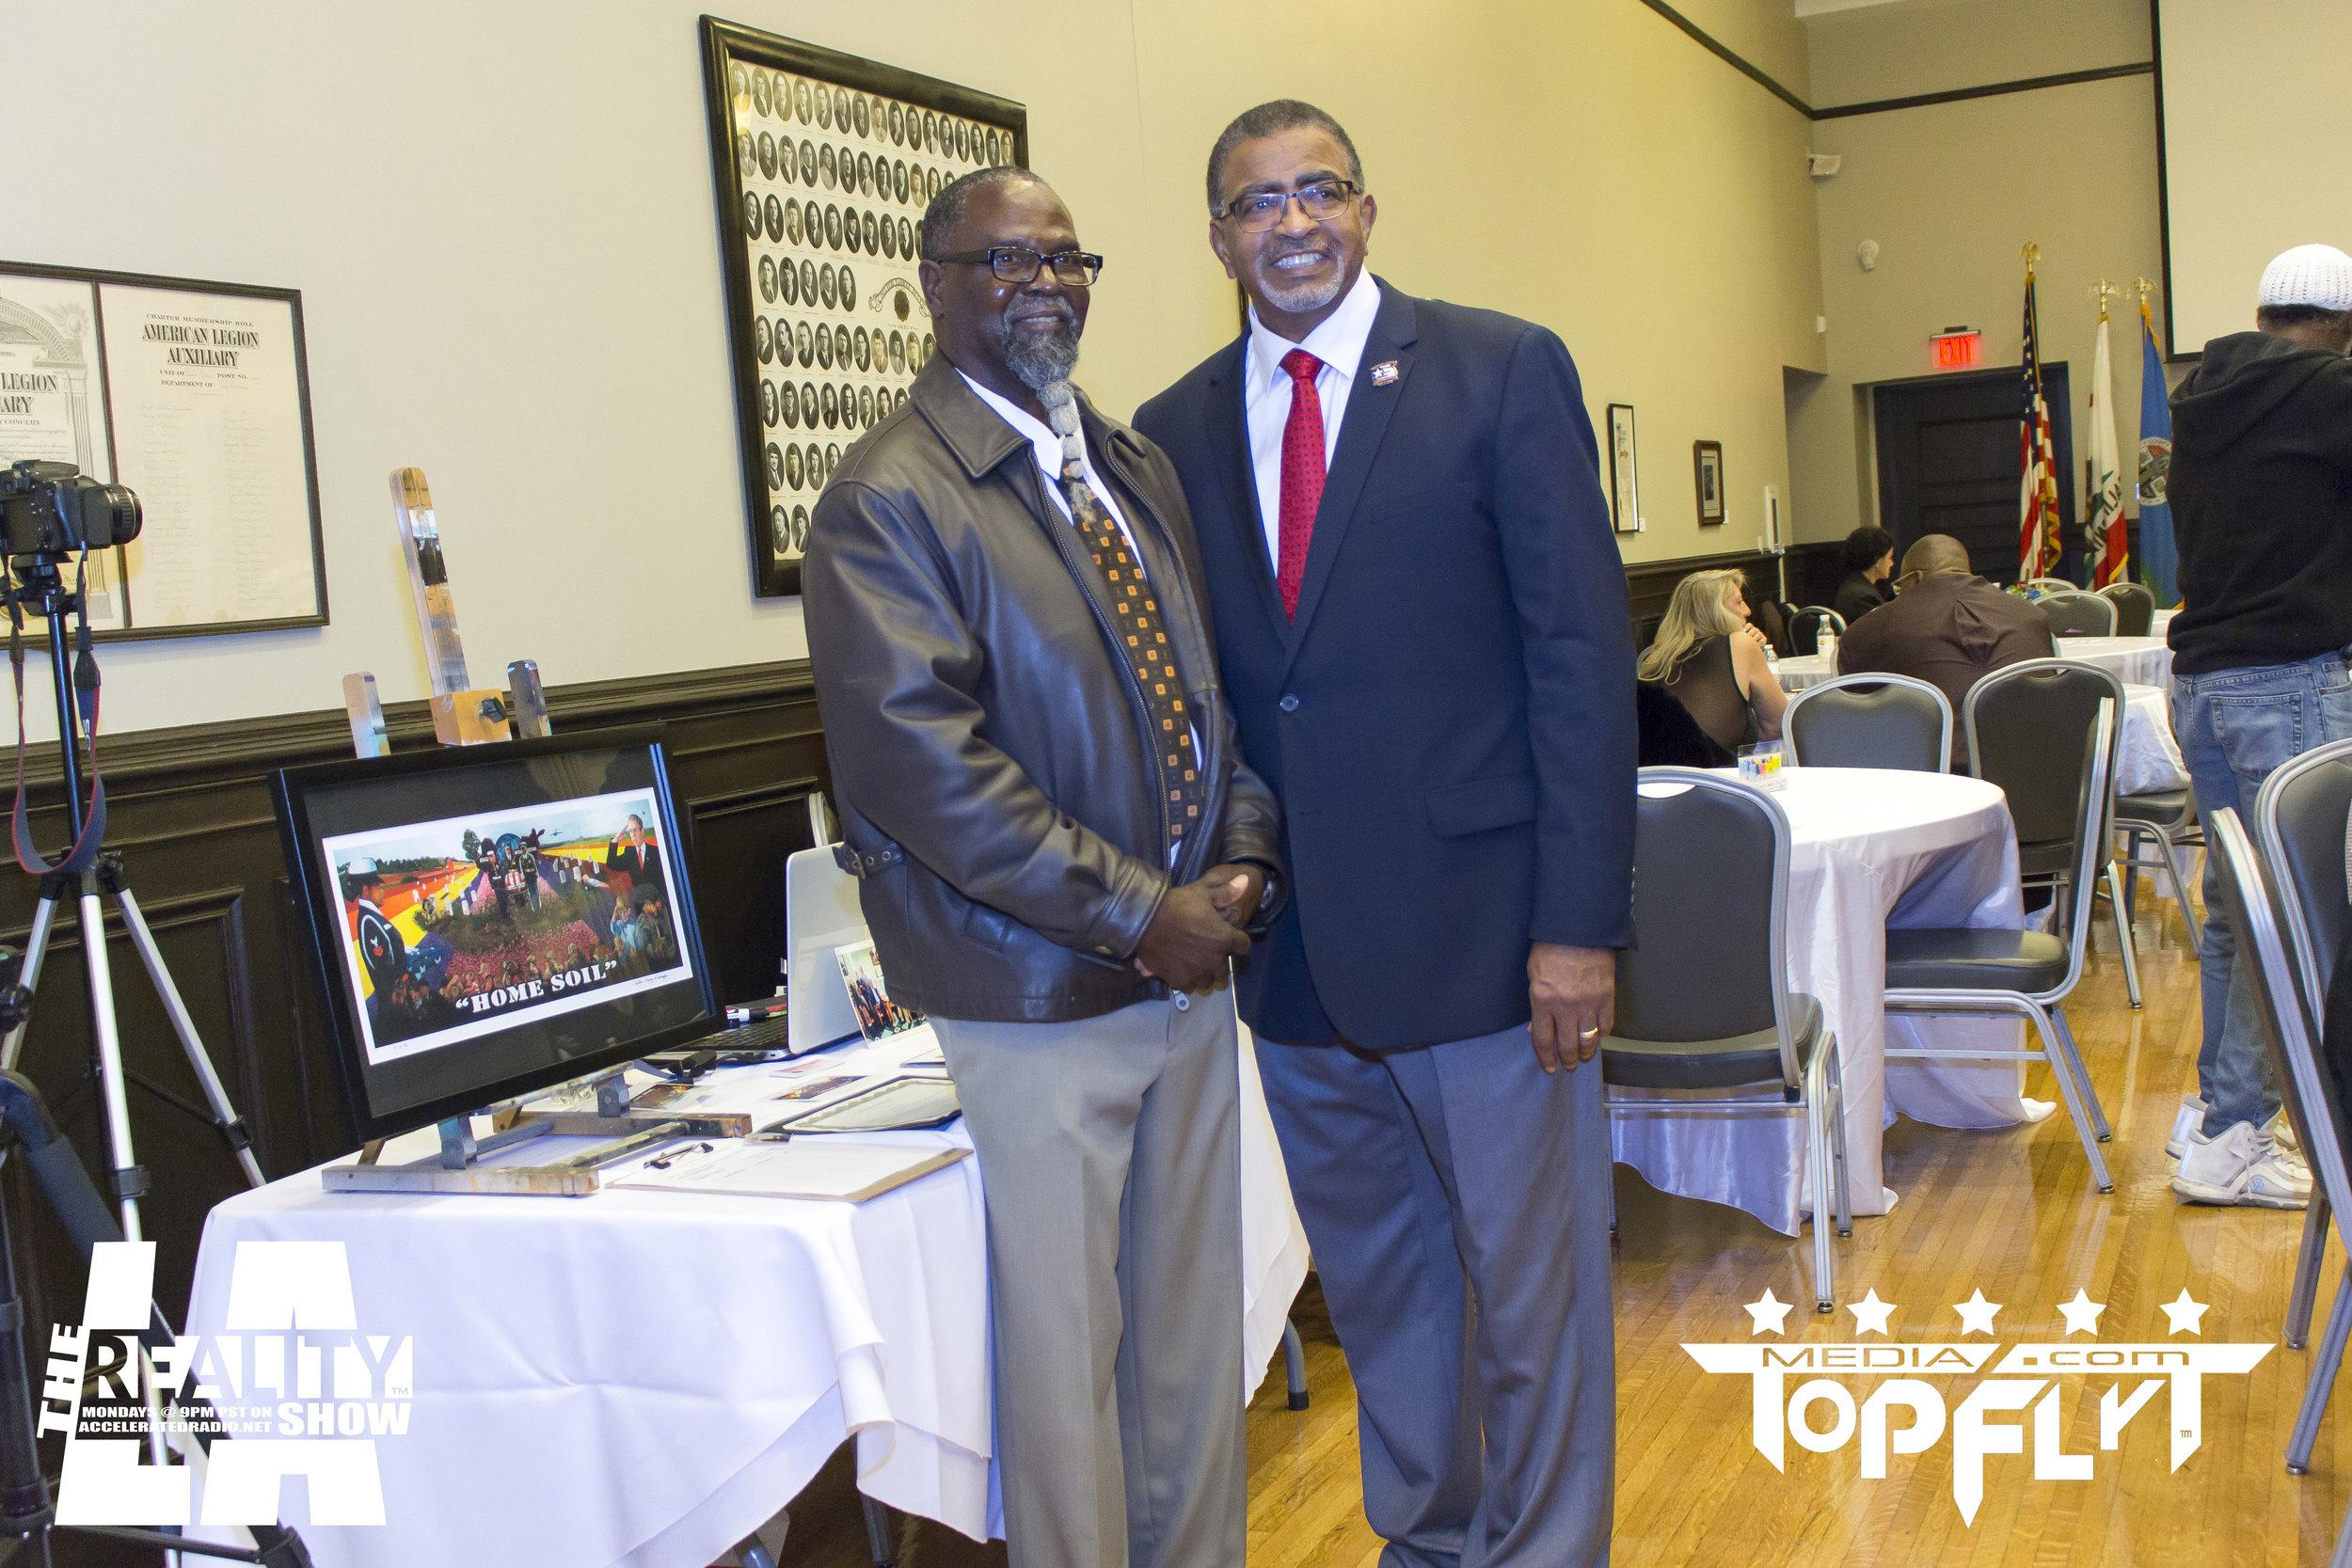 The Reality Show LA - Tuskegee Airmen 75th Anniversary VIP Reception_97.jpg